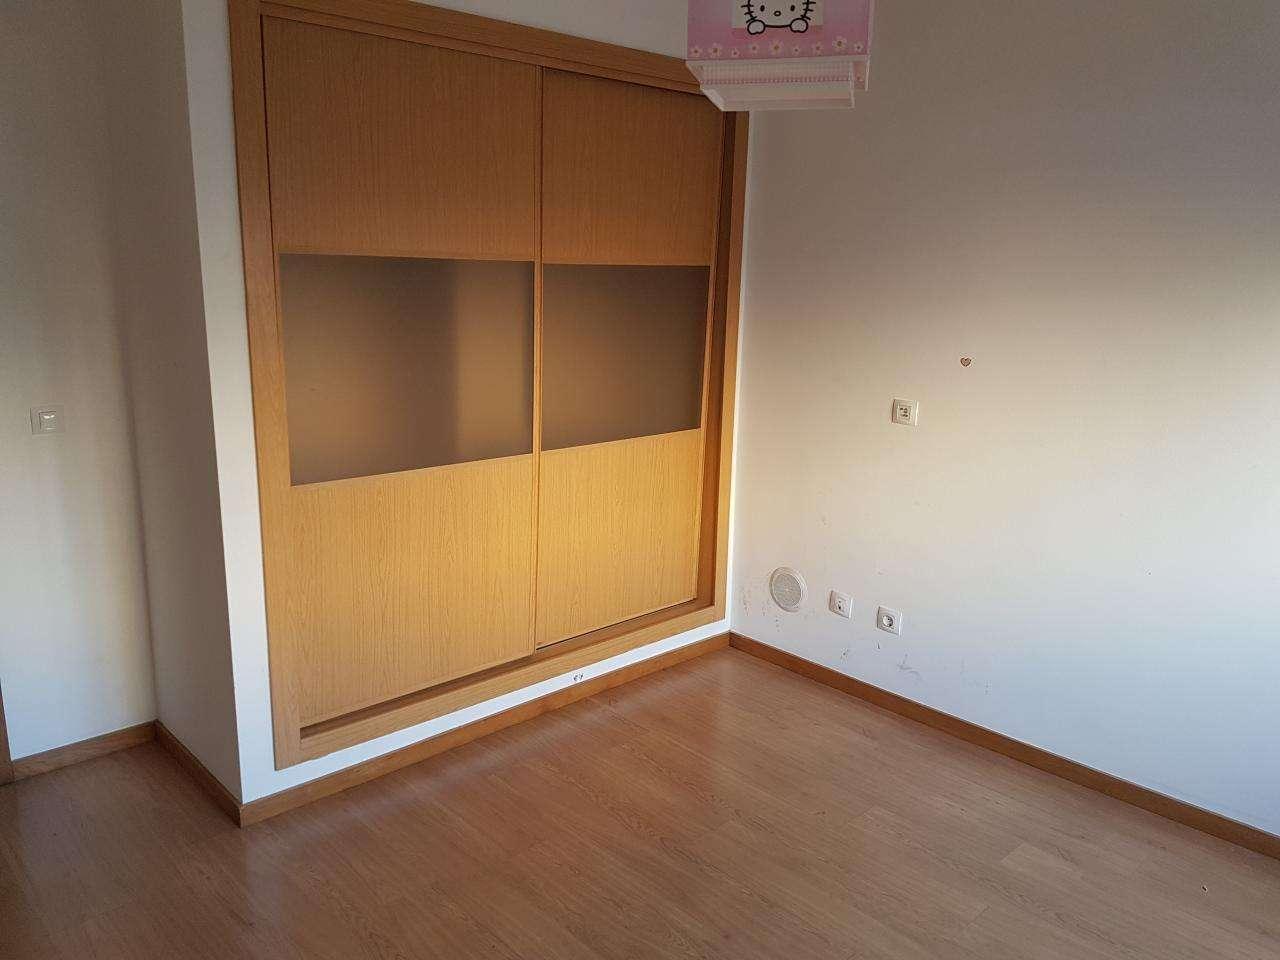 Apartamento para comprar, Odivelas, Lisboa - Foto 18